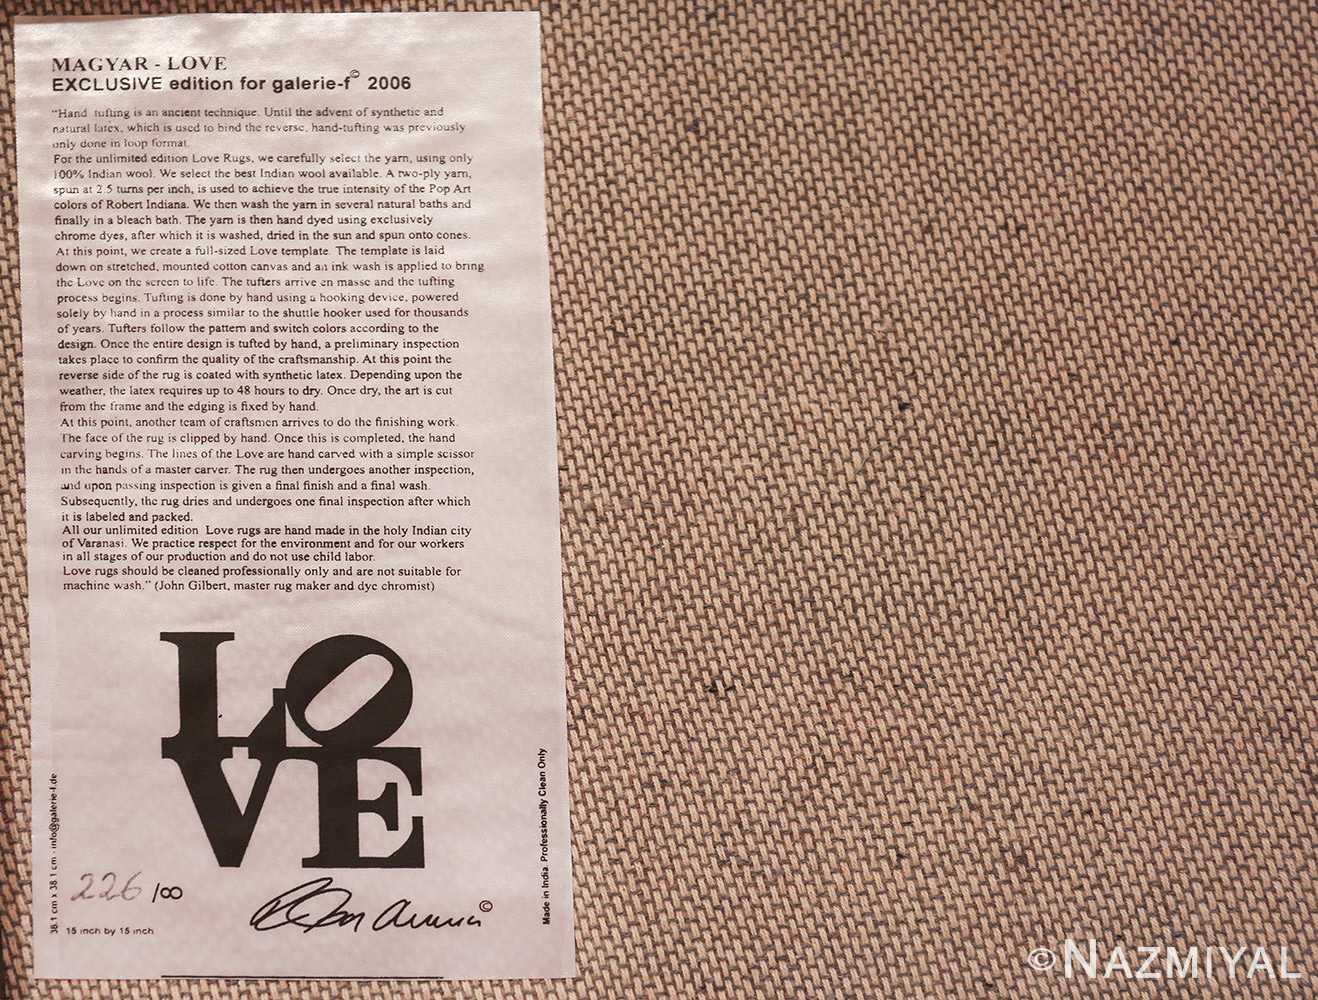 modern pop art classic love rug by robert indiana 49740 tag Nazmiyal